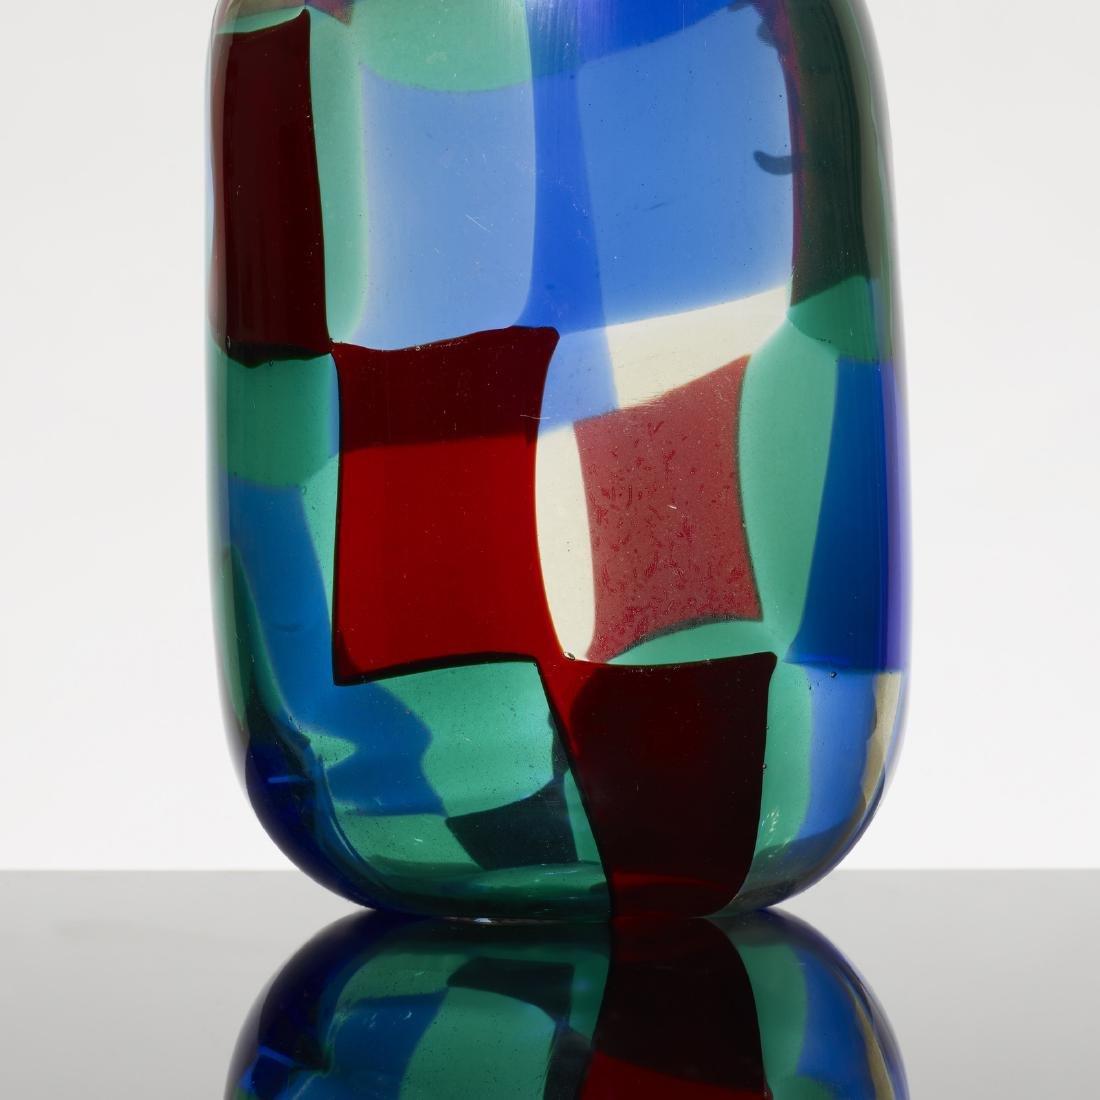 Fulvio Bianconi, prototype Pezzato vase, model 905 L64 - 3